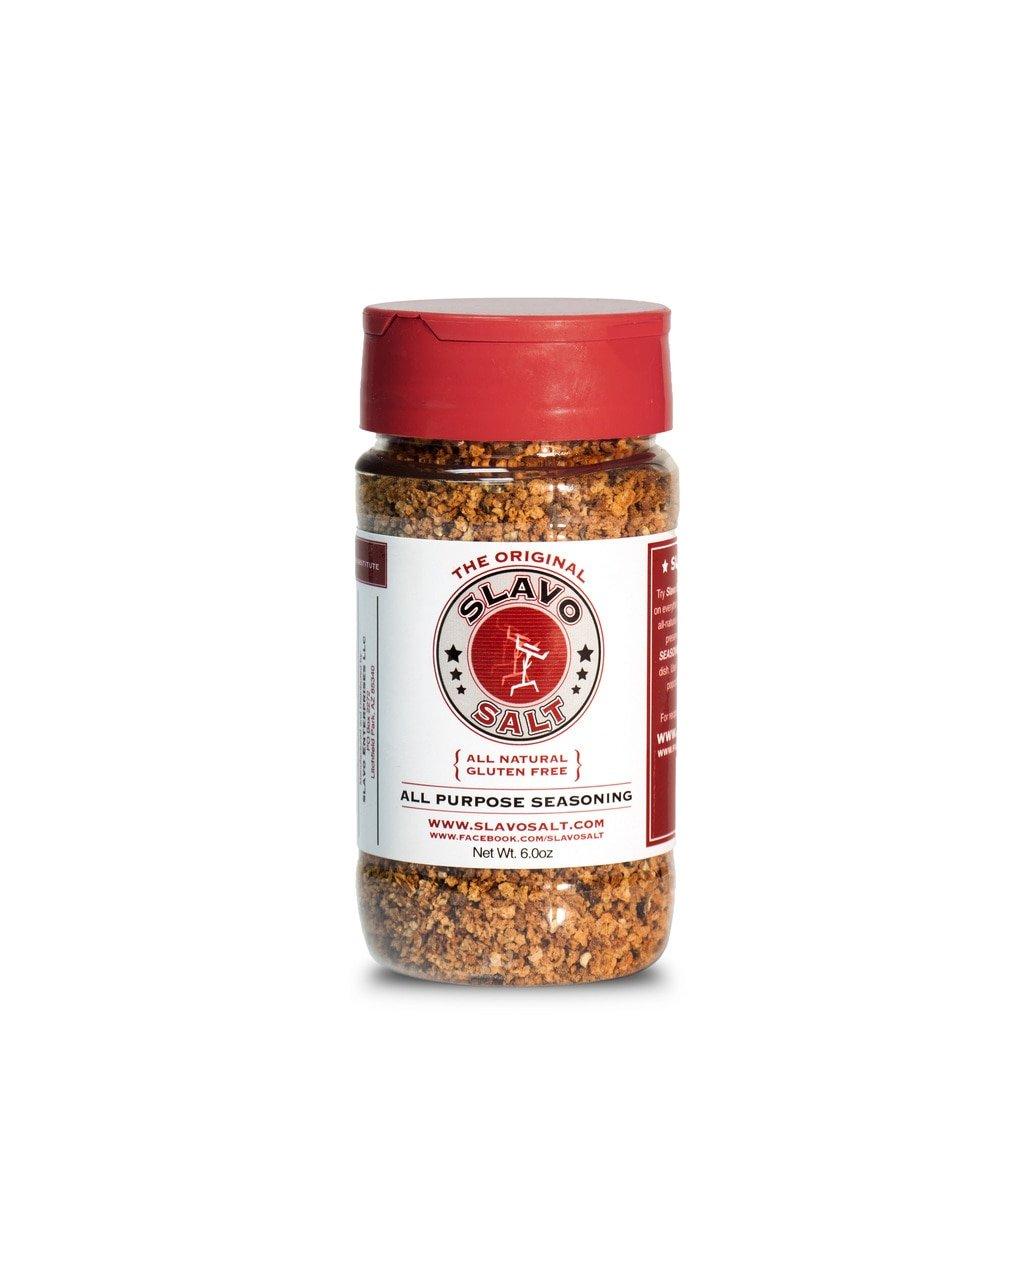 Slavo Salt All Purpose Seasoning (13 ounce) – Fresh Garlic, Kosher Salt and Black Peppercorn - Whole 30, Keto and Paleo ––